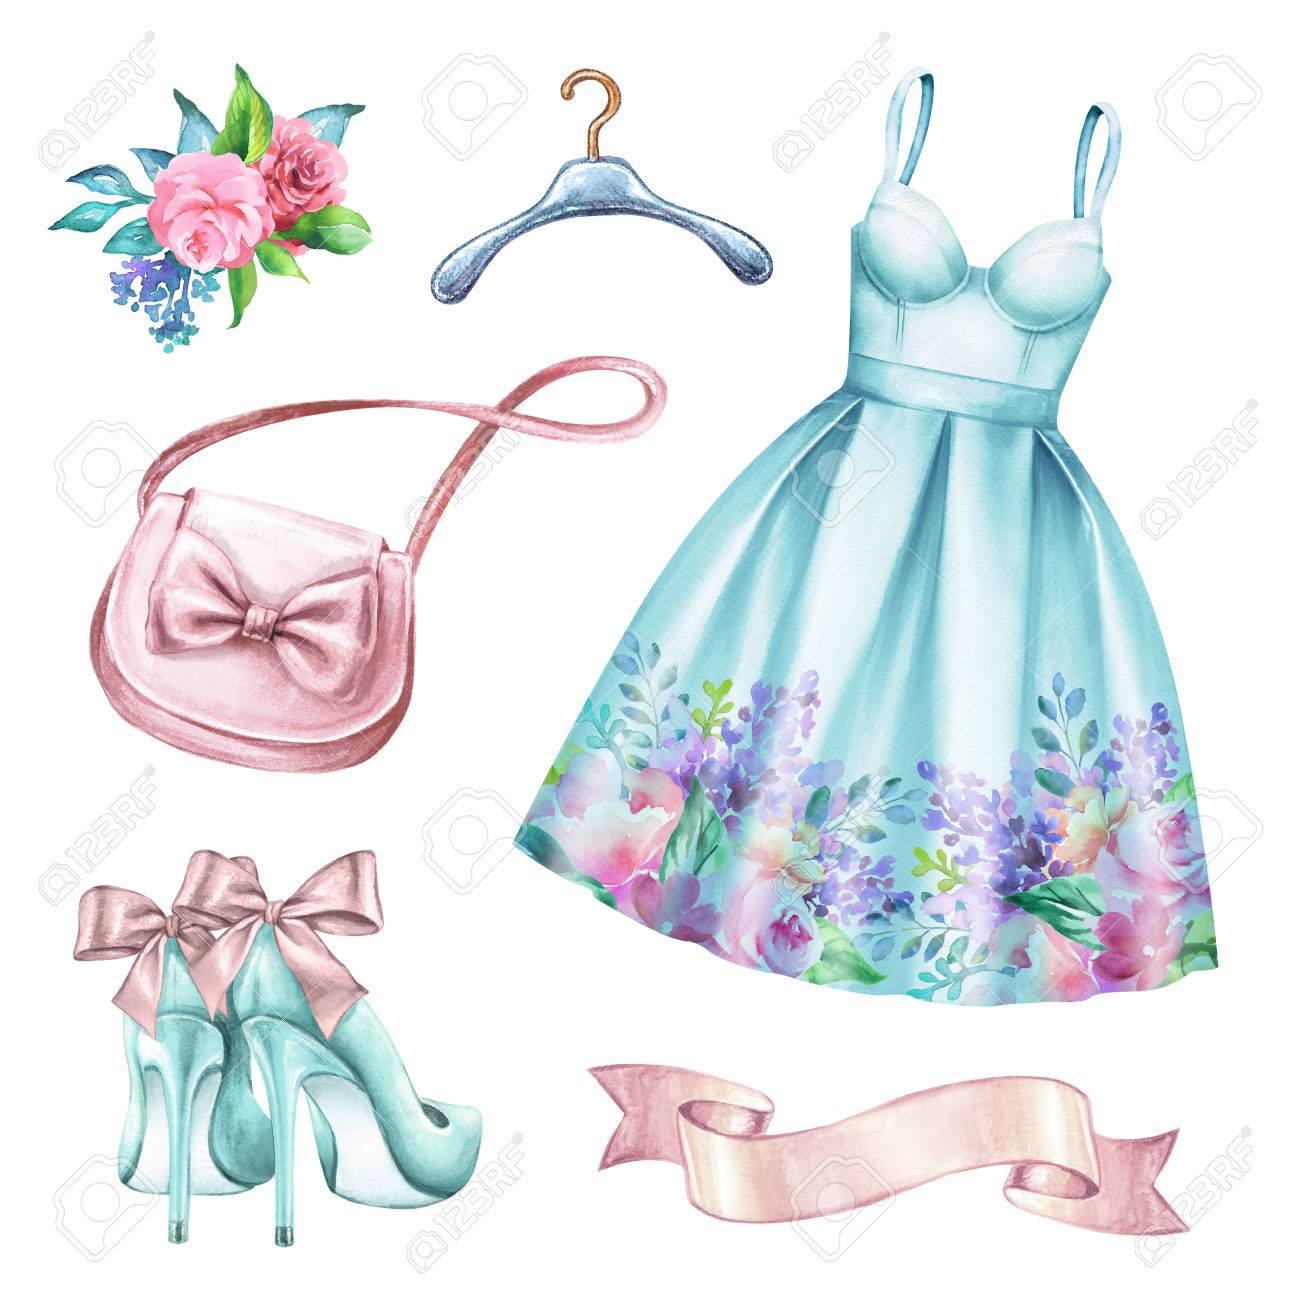 Watercolor Wedding Fashion Illustration, Festive Accessories ...